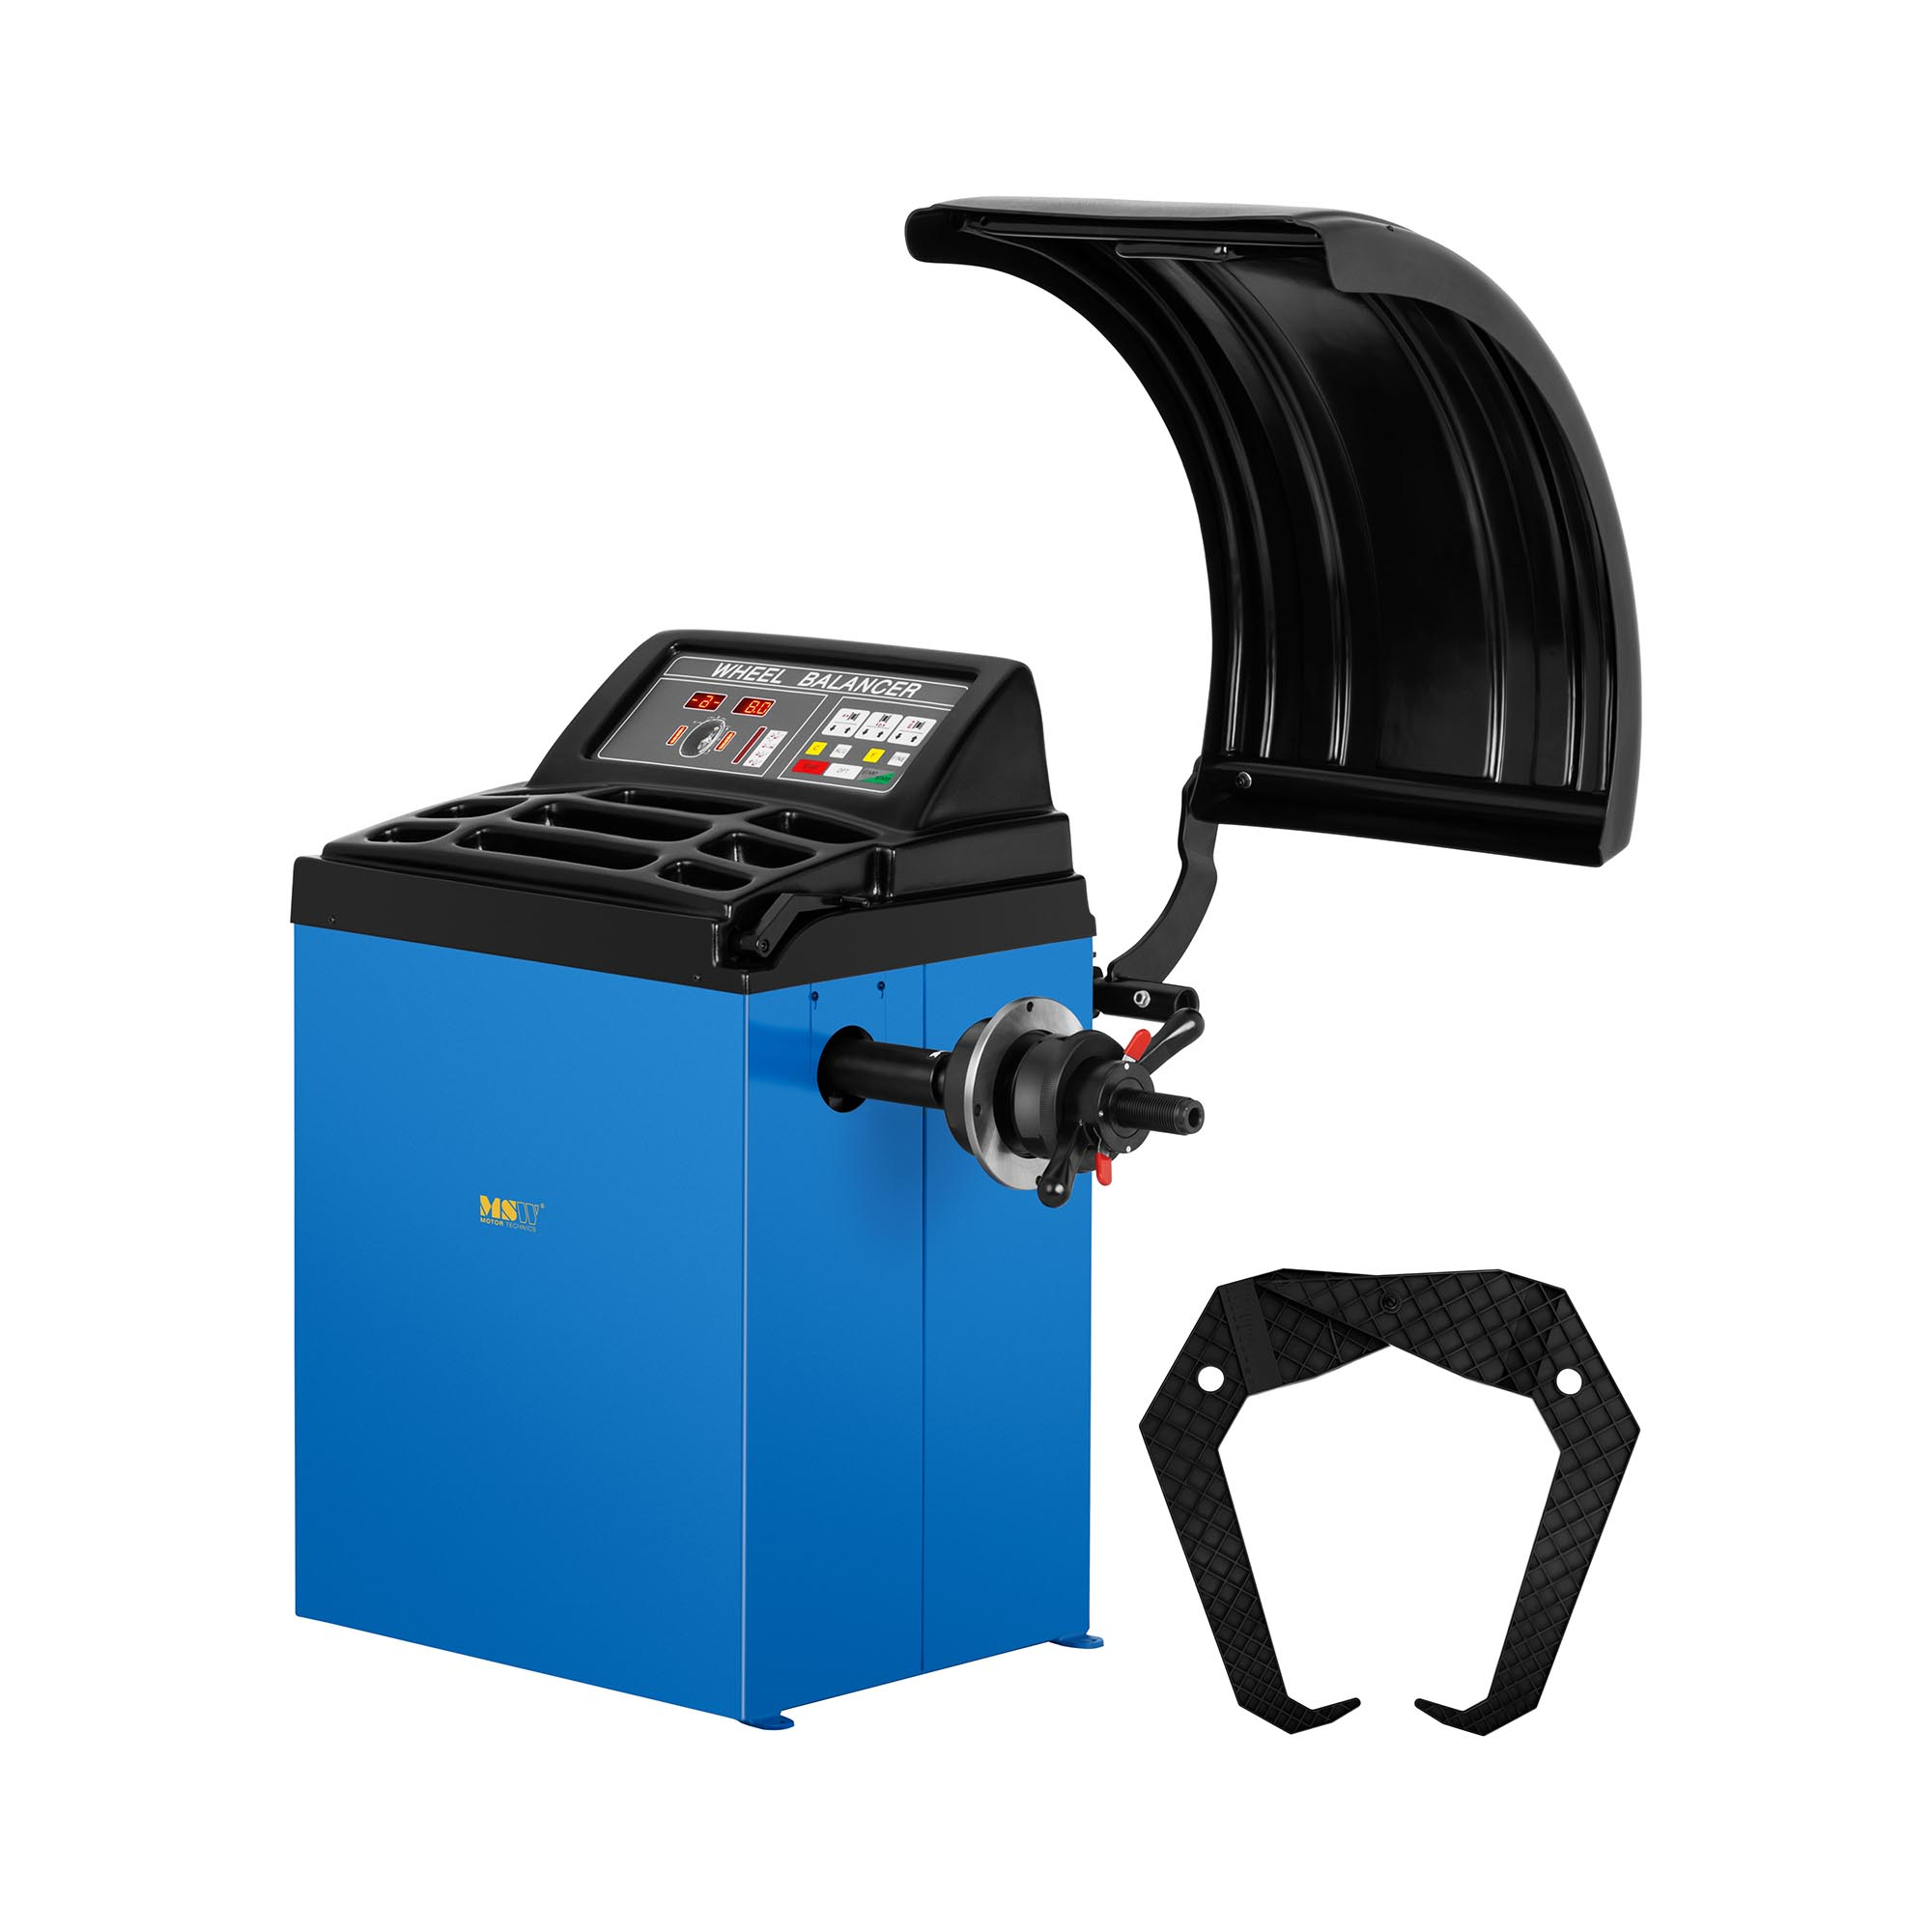 MSW Reifenwuchtmaschine 10060774